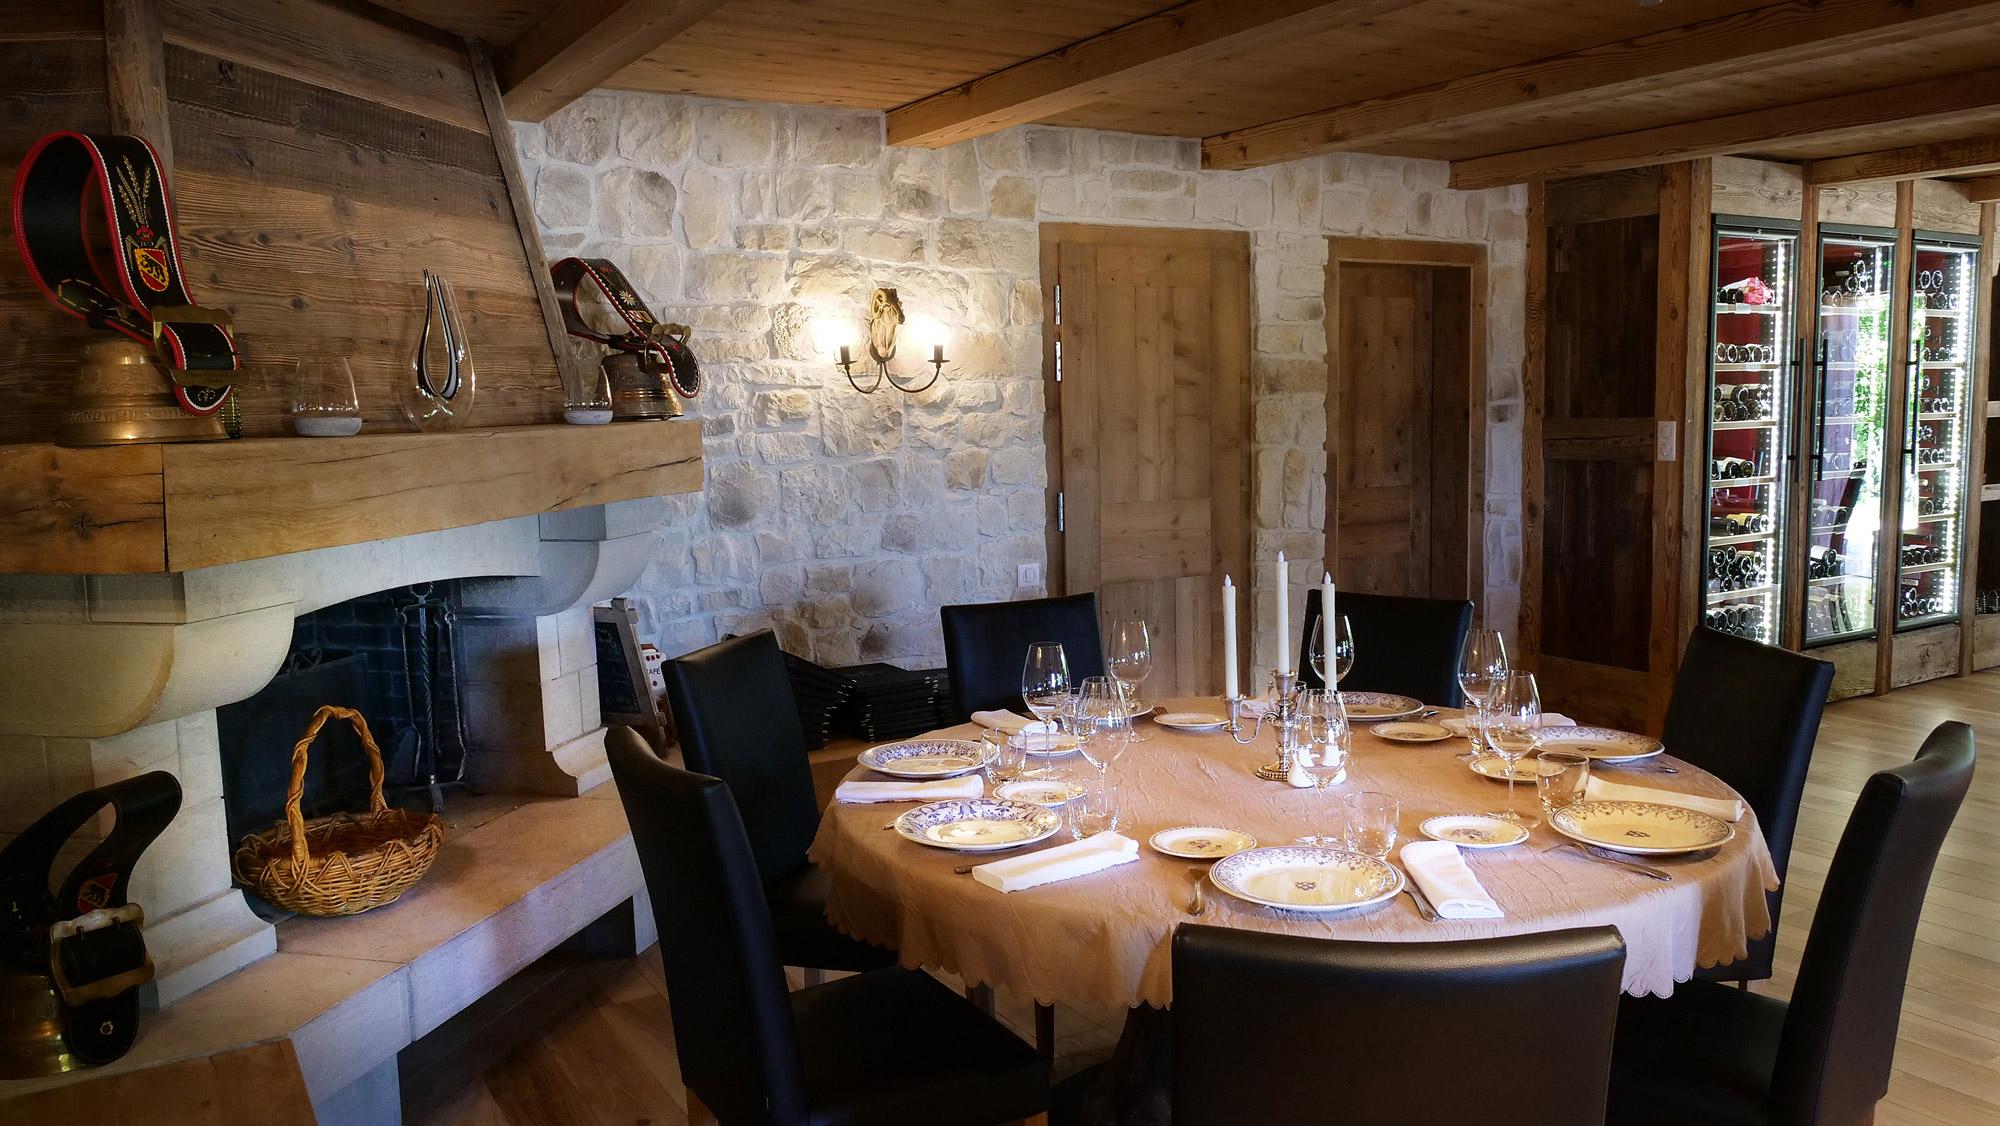 Hôtel Restaurant Le Tillau, Vallorbe